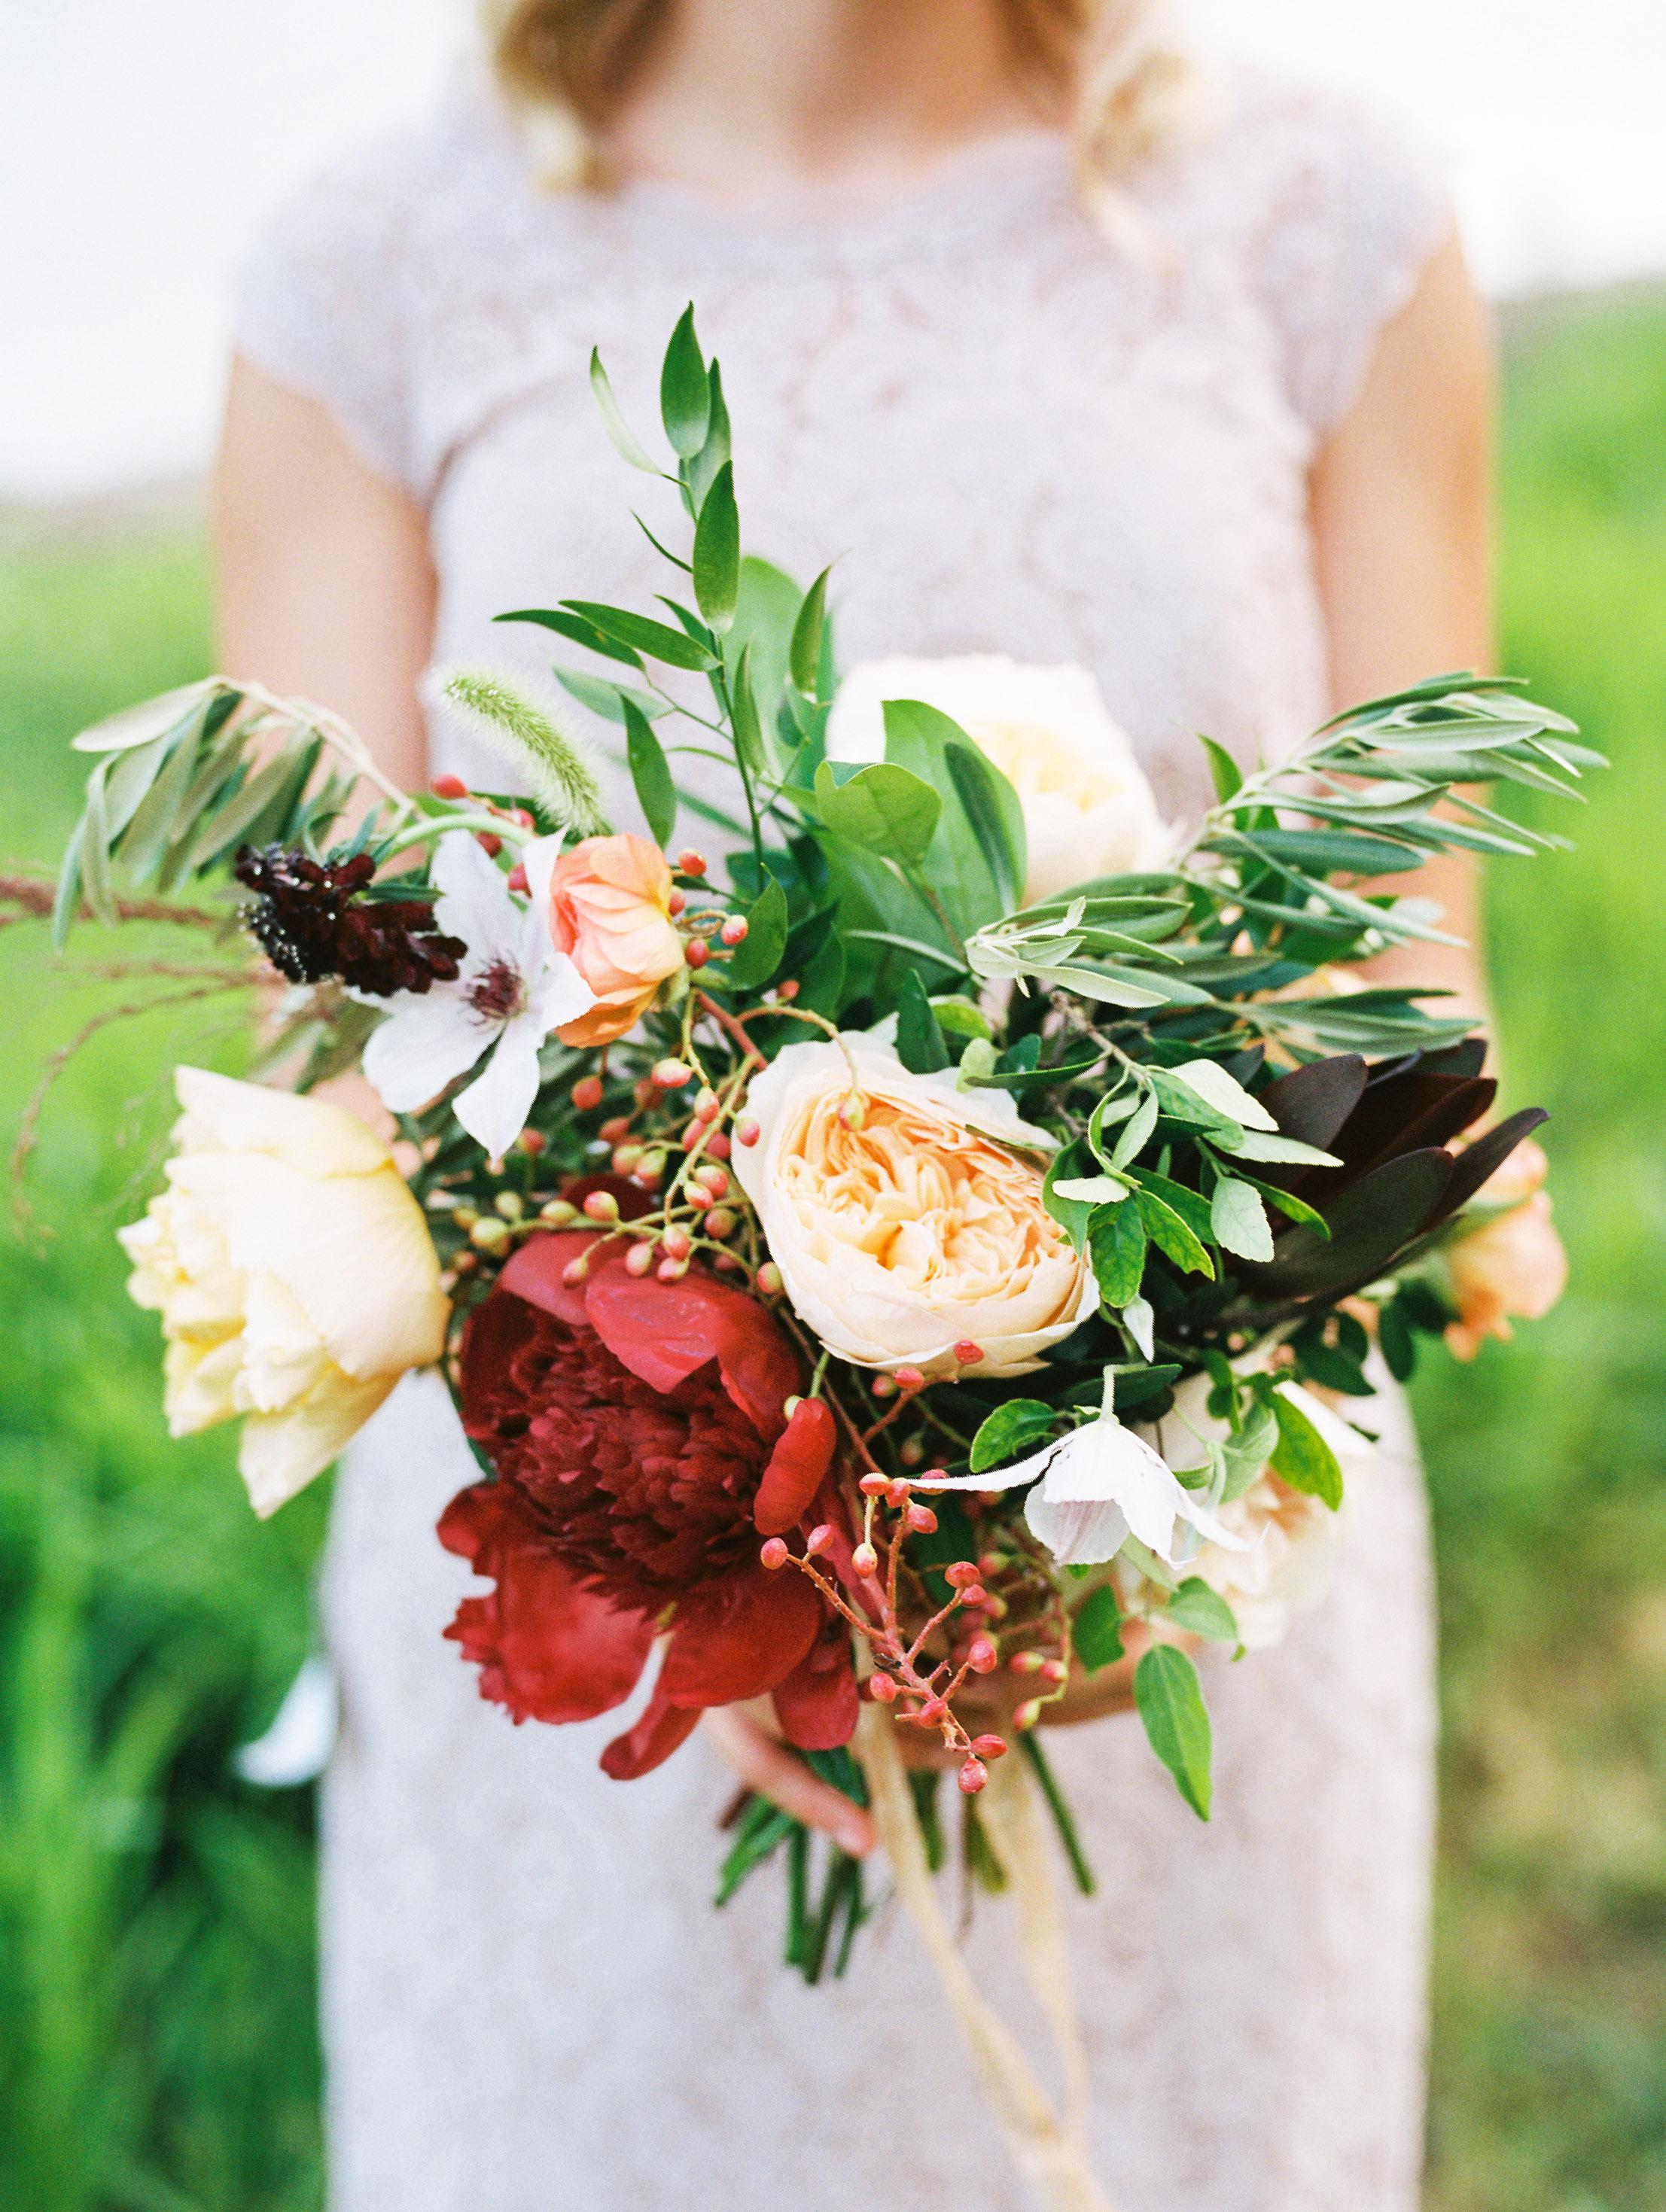 Floral Friday | Wild Bouquet by Holly Viles Design via daniellemsabol.com